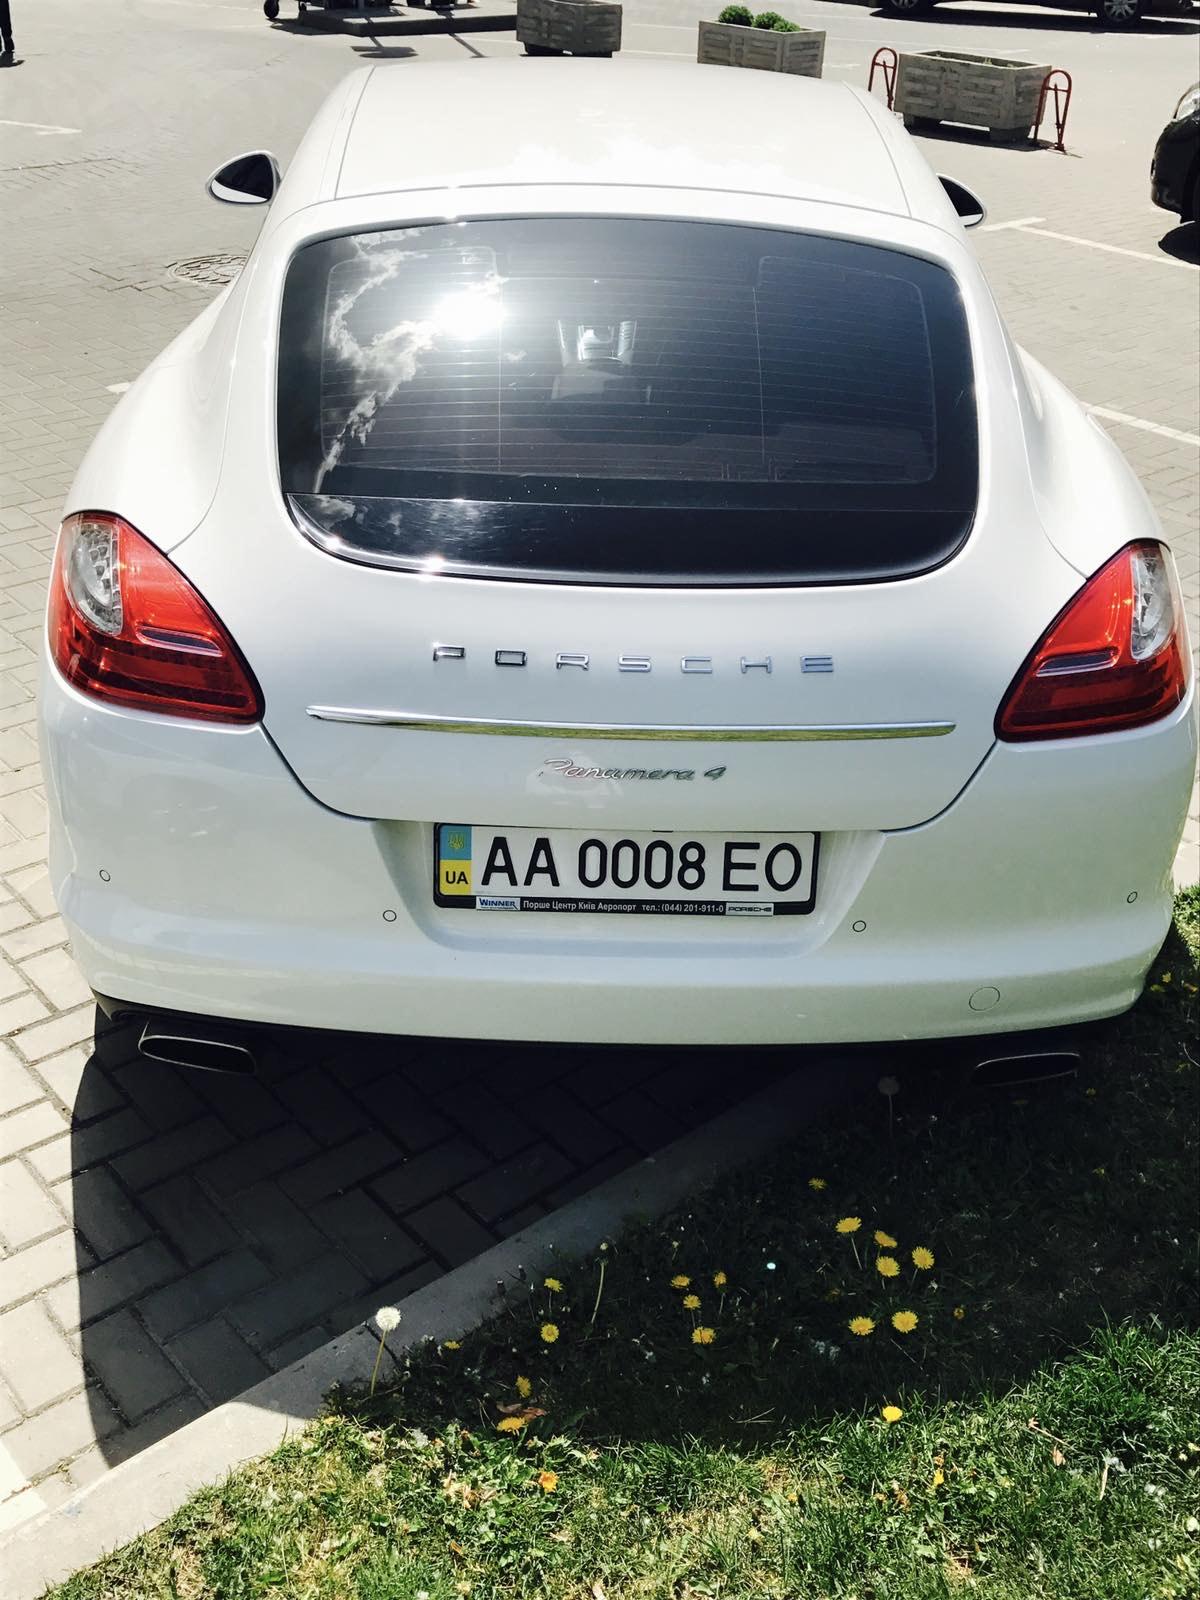 cabriolet, sports car rental in Kiev Porsche Panamera (4)